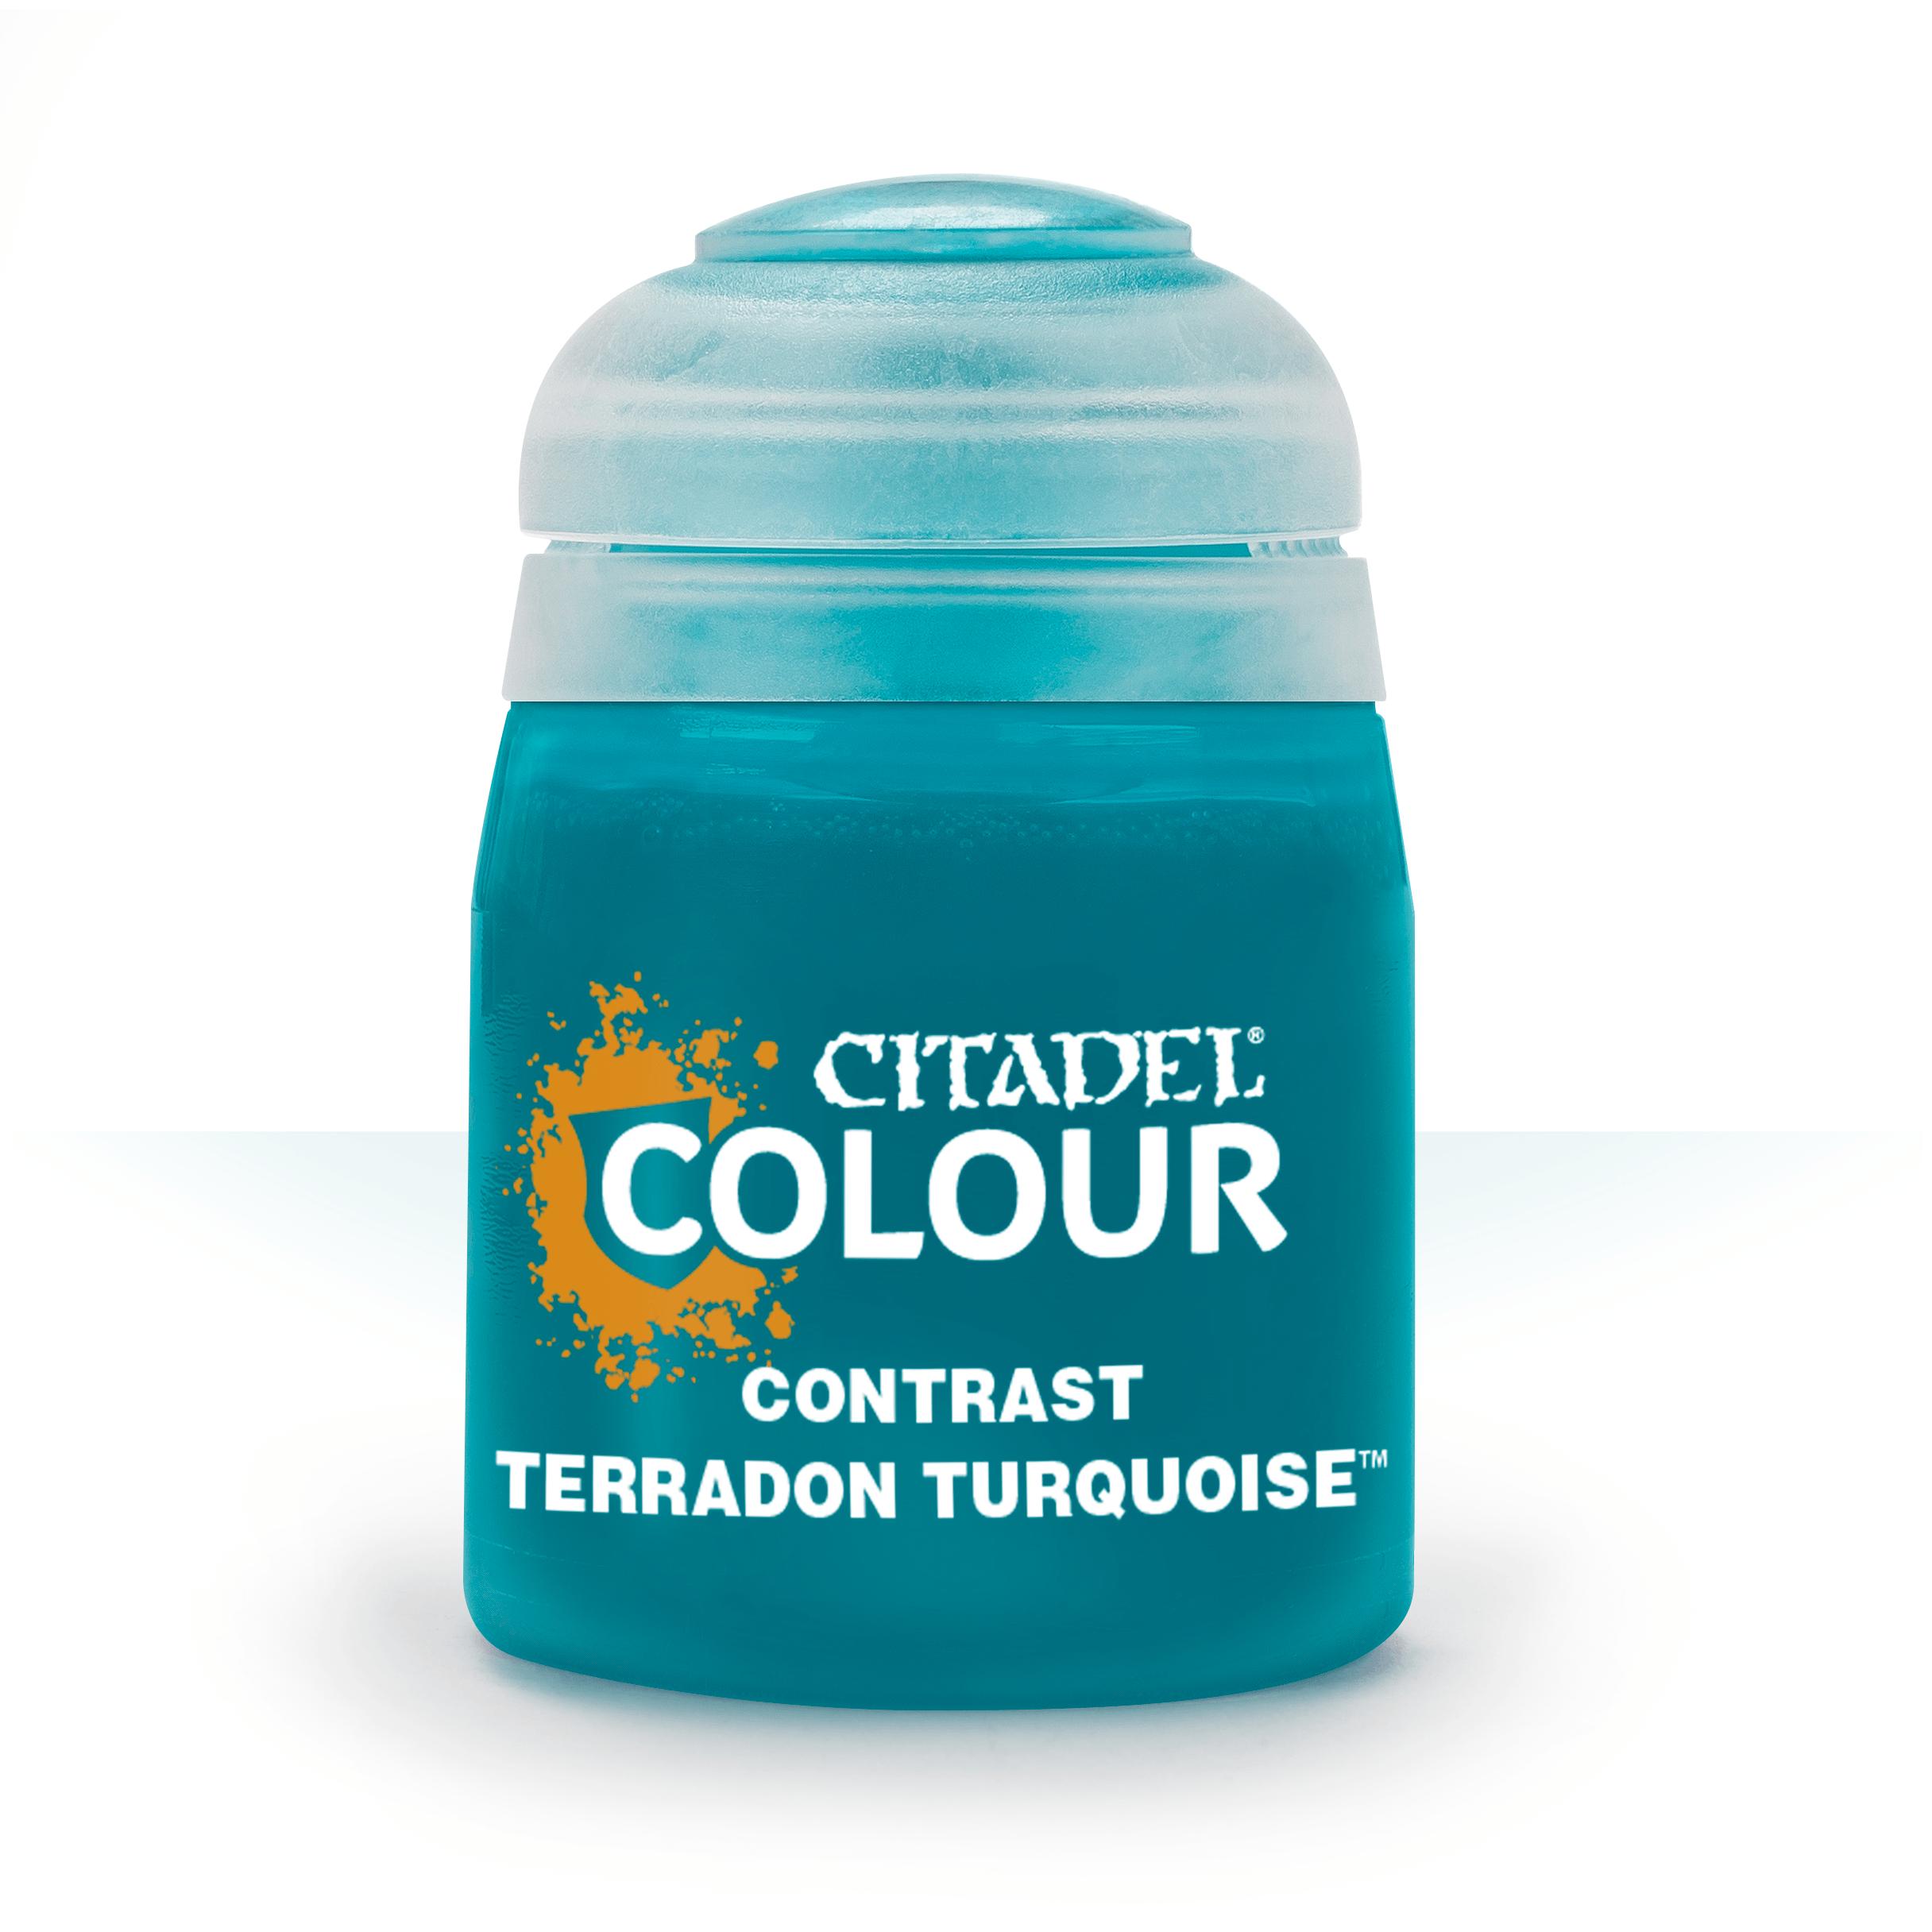 Terradon Turquoise, Citadel Contrast 18ml